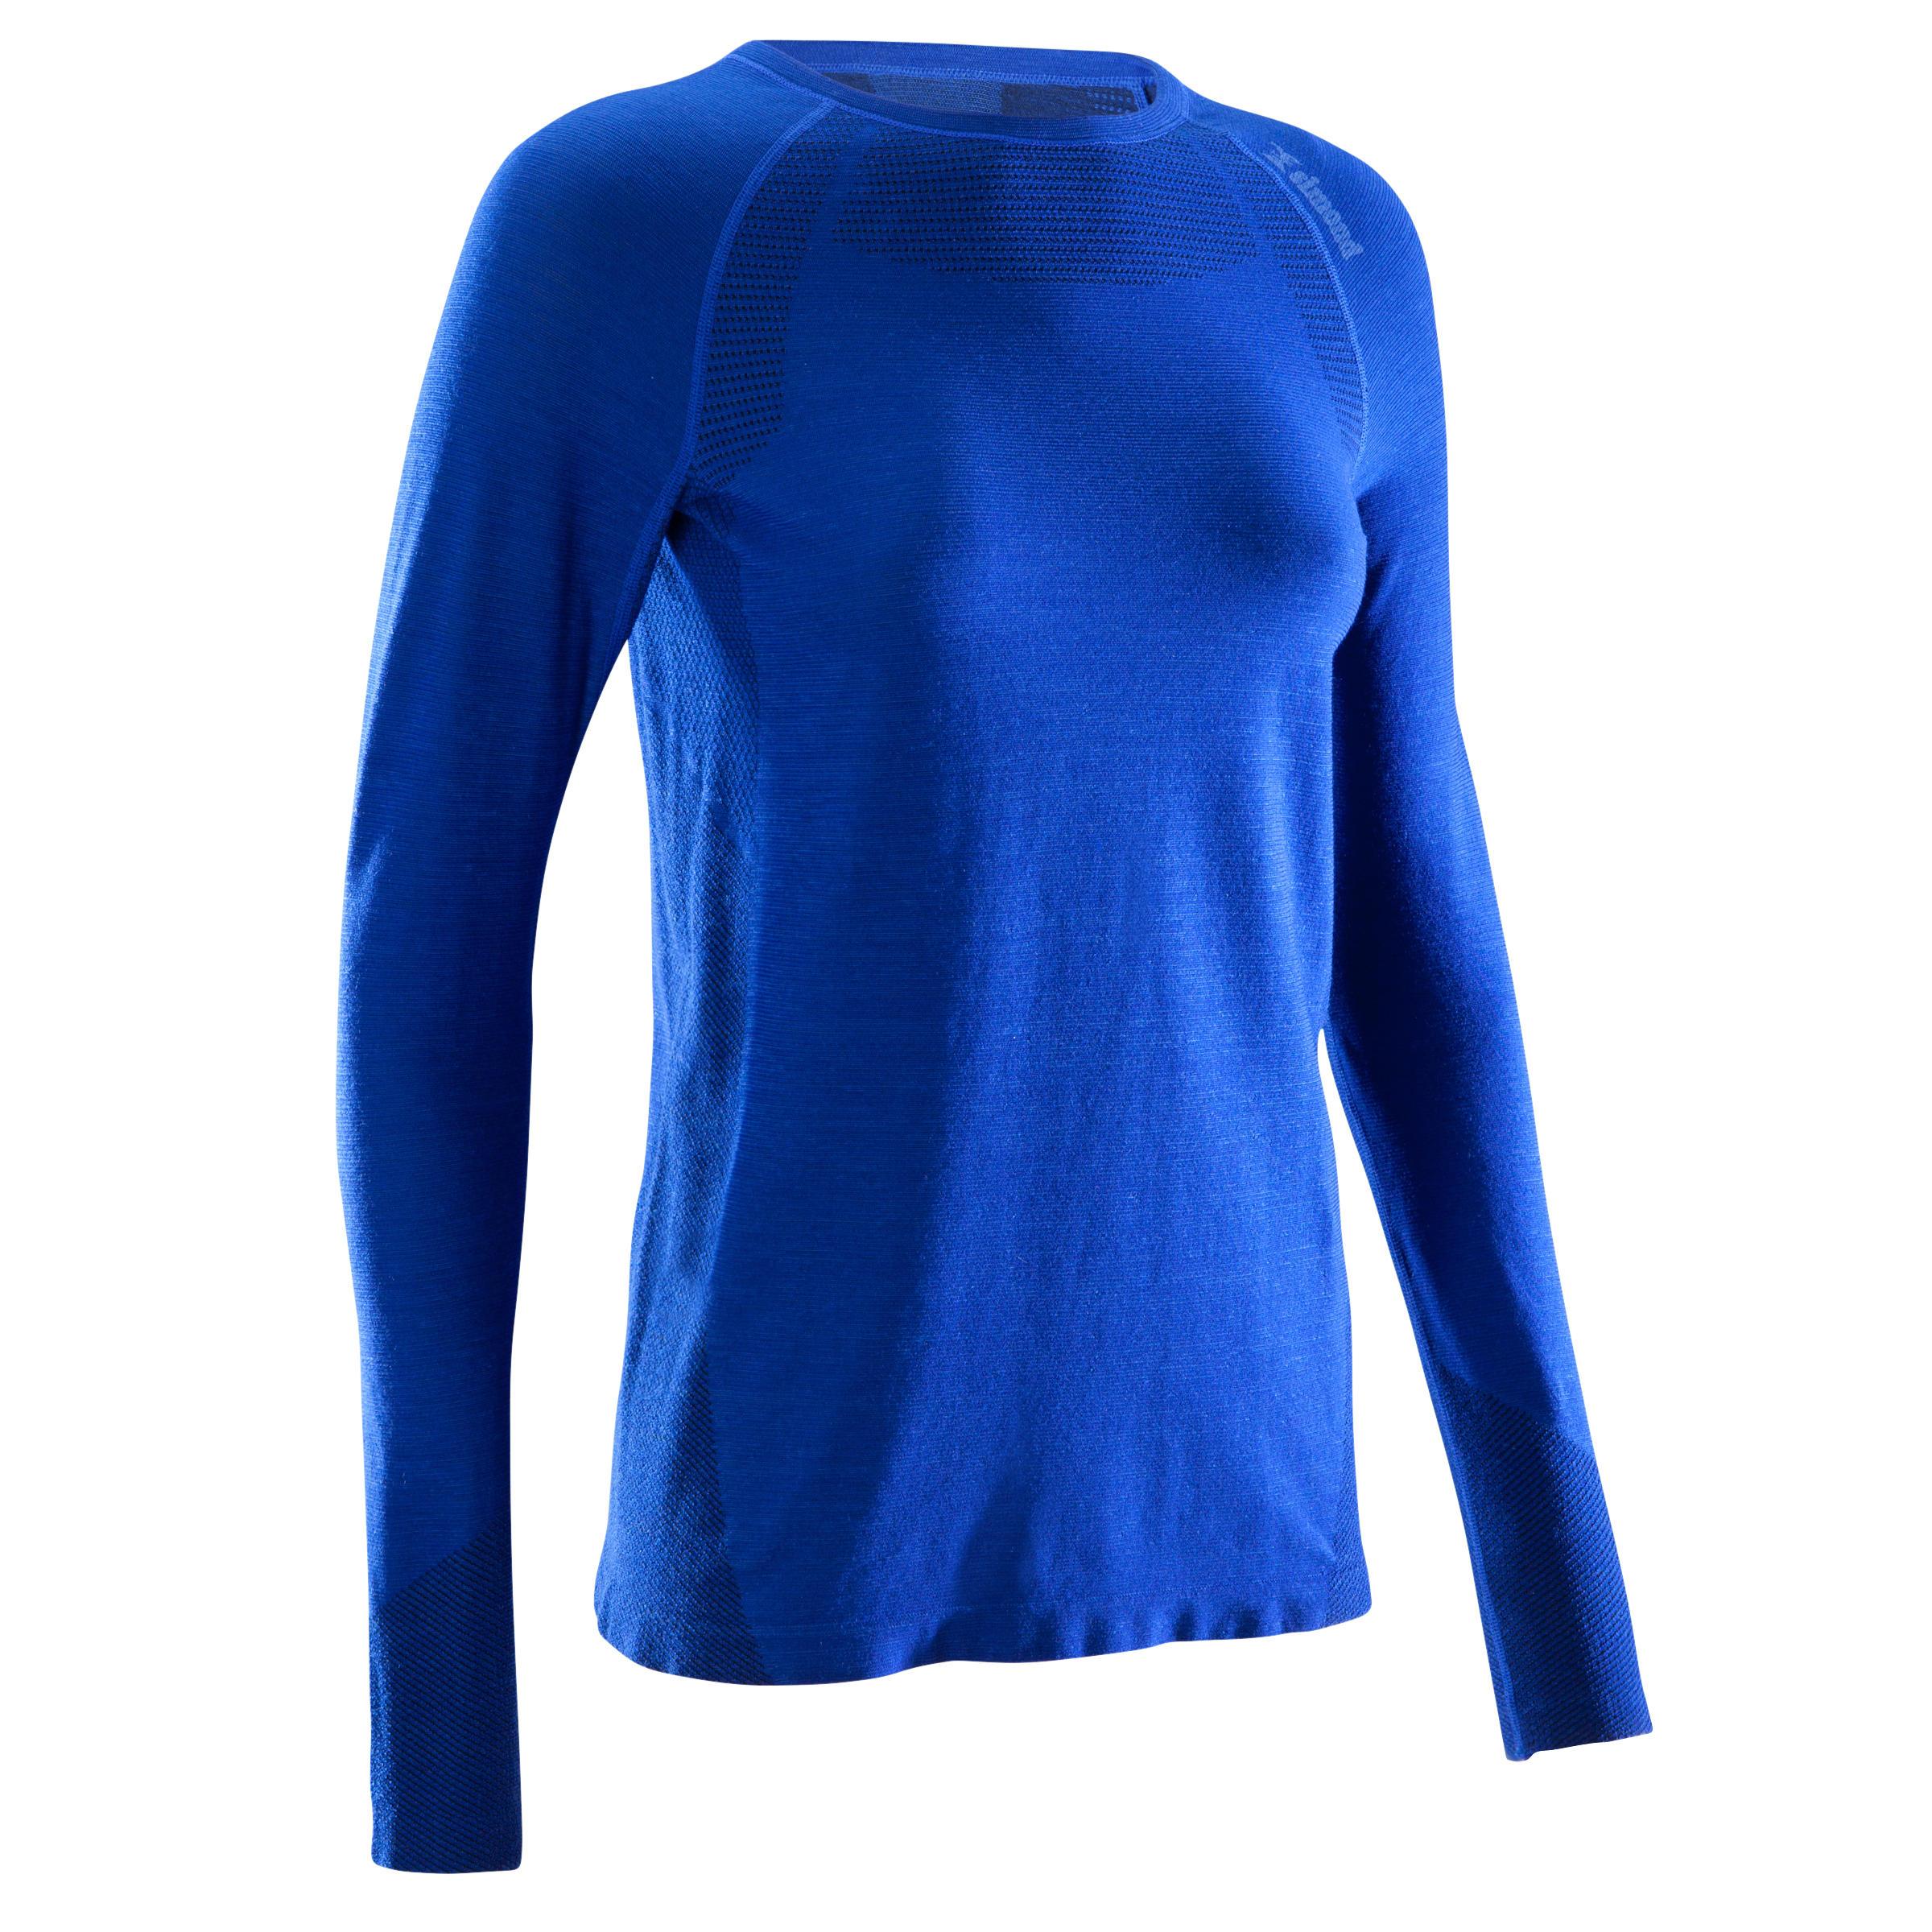 Funktionsshirt langarm Seamless 40% Wolle Damen blau | Bekleidung > Shirts > Funktionsshirts | Simond